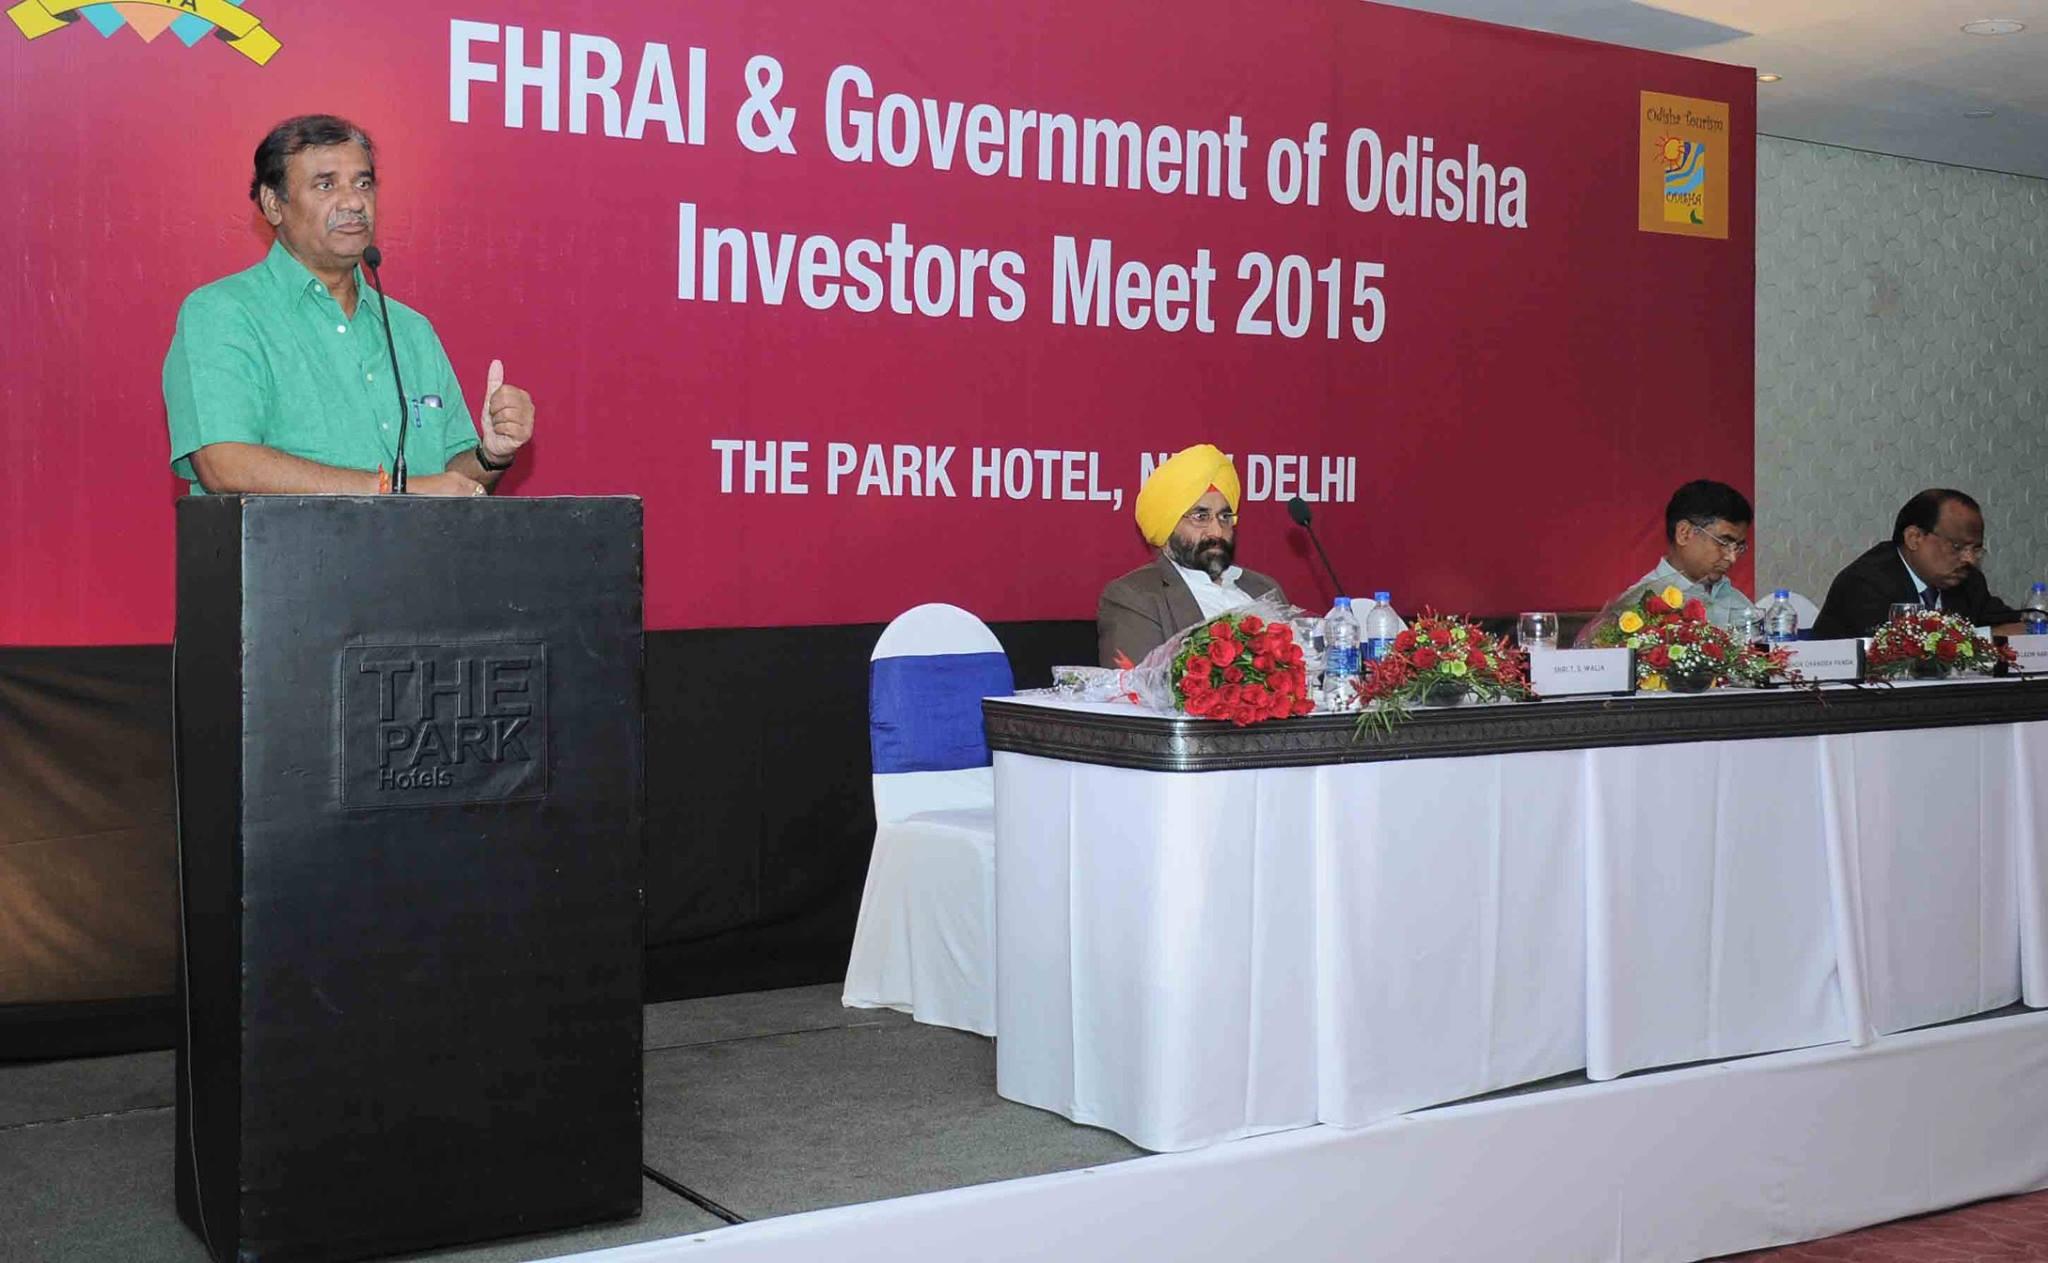 FHRAI odisha govt meet bhubaneswar buzz